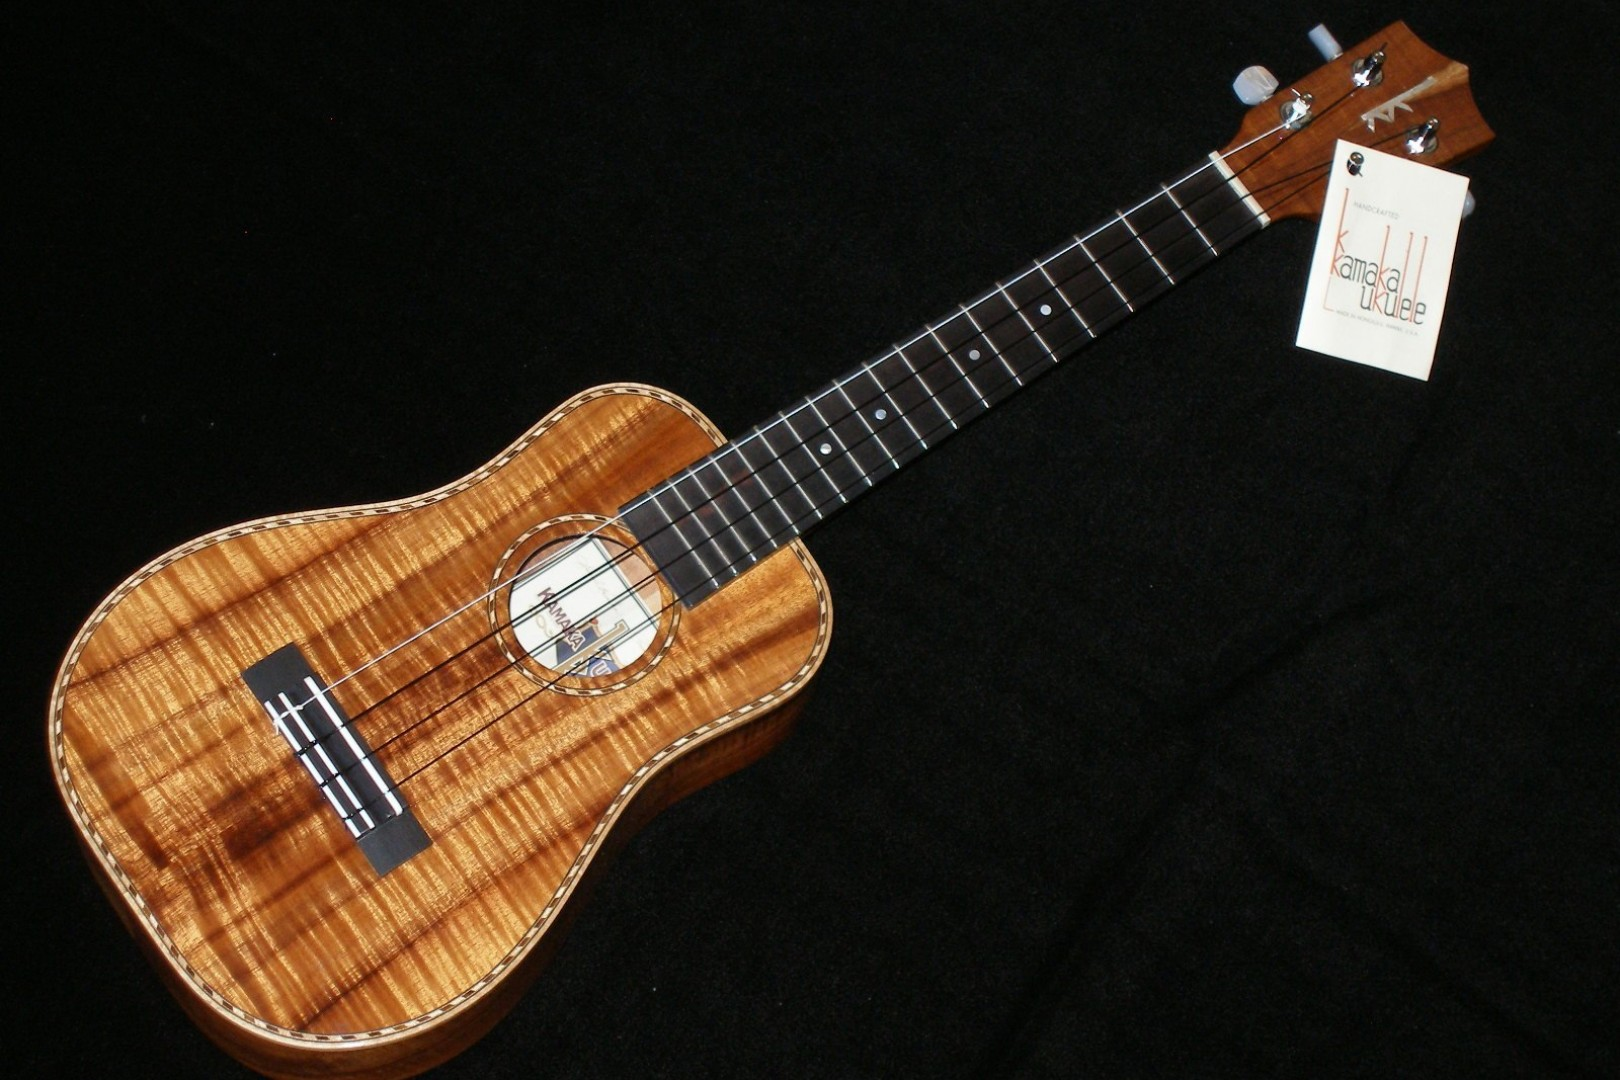 ukulele friend kamaka ohta san ukulele for sale ukulele friend. Black Bedroom Furniture Sets. Home Design Ideas